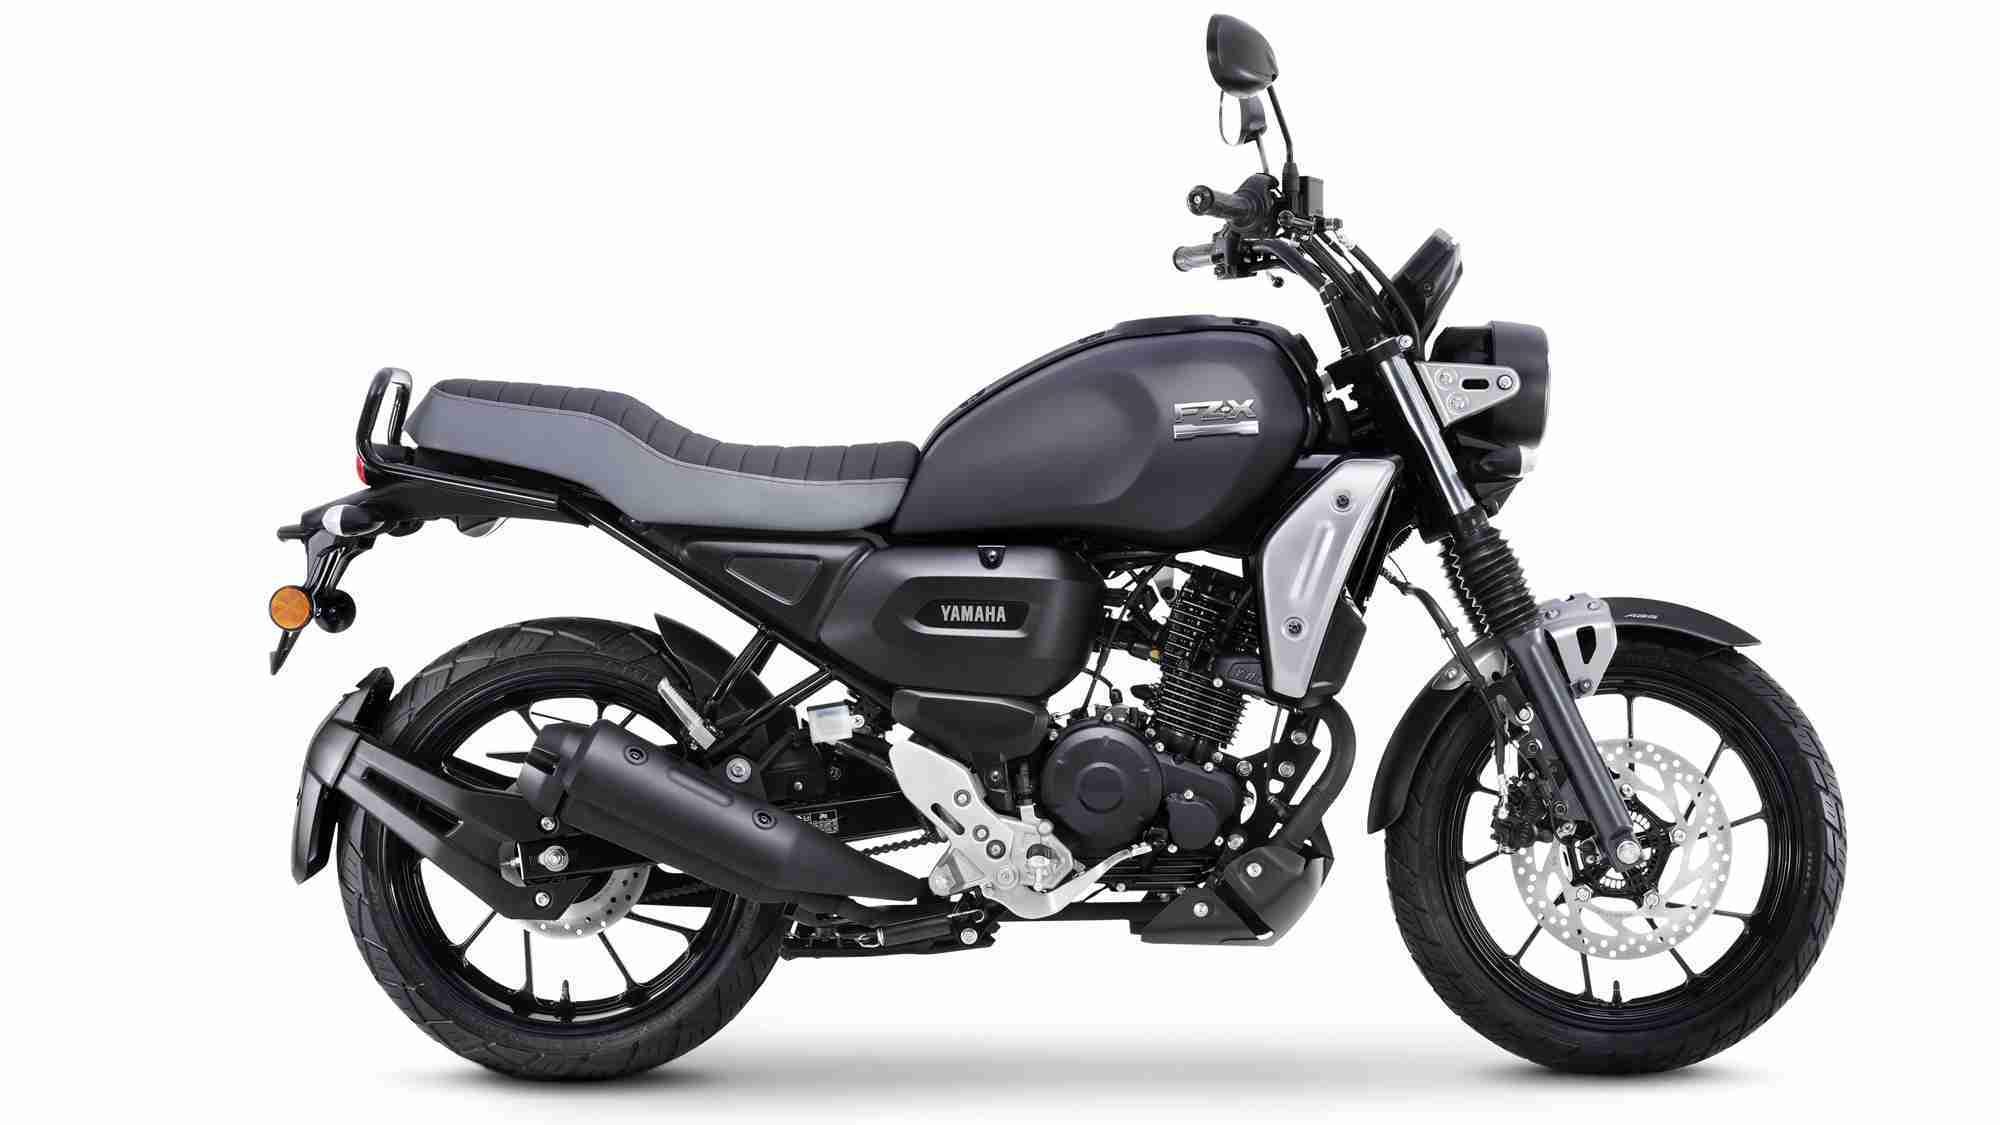 Yamaha FZ-X Matt Black colour option